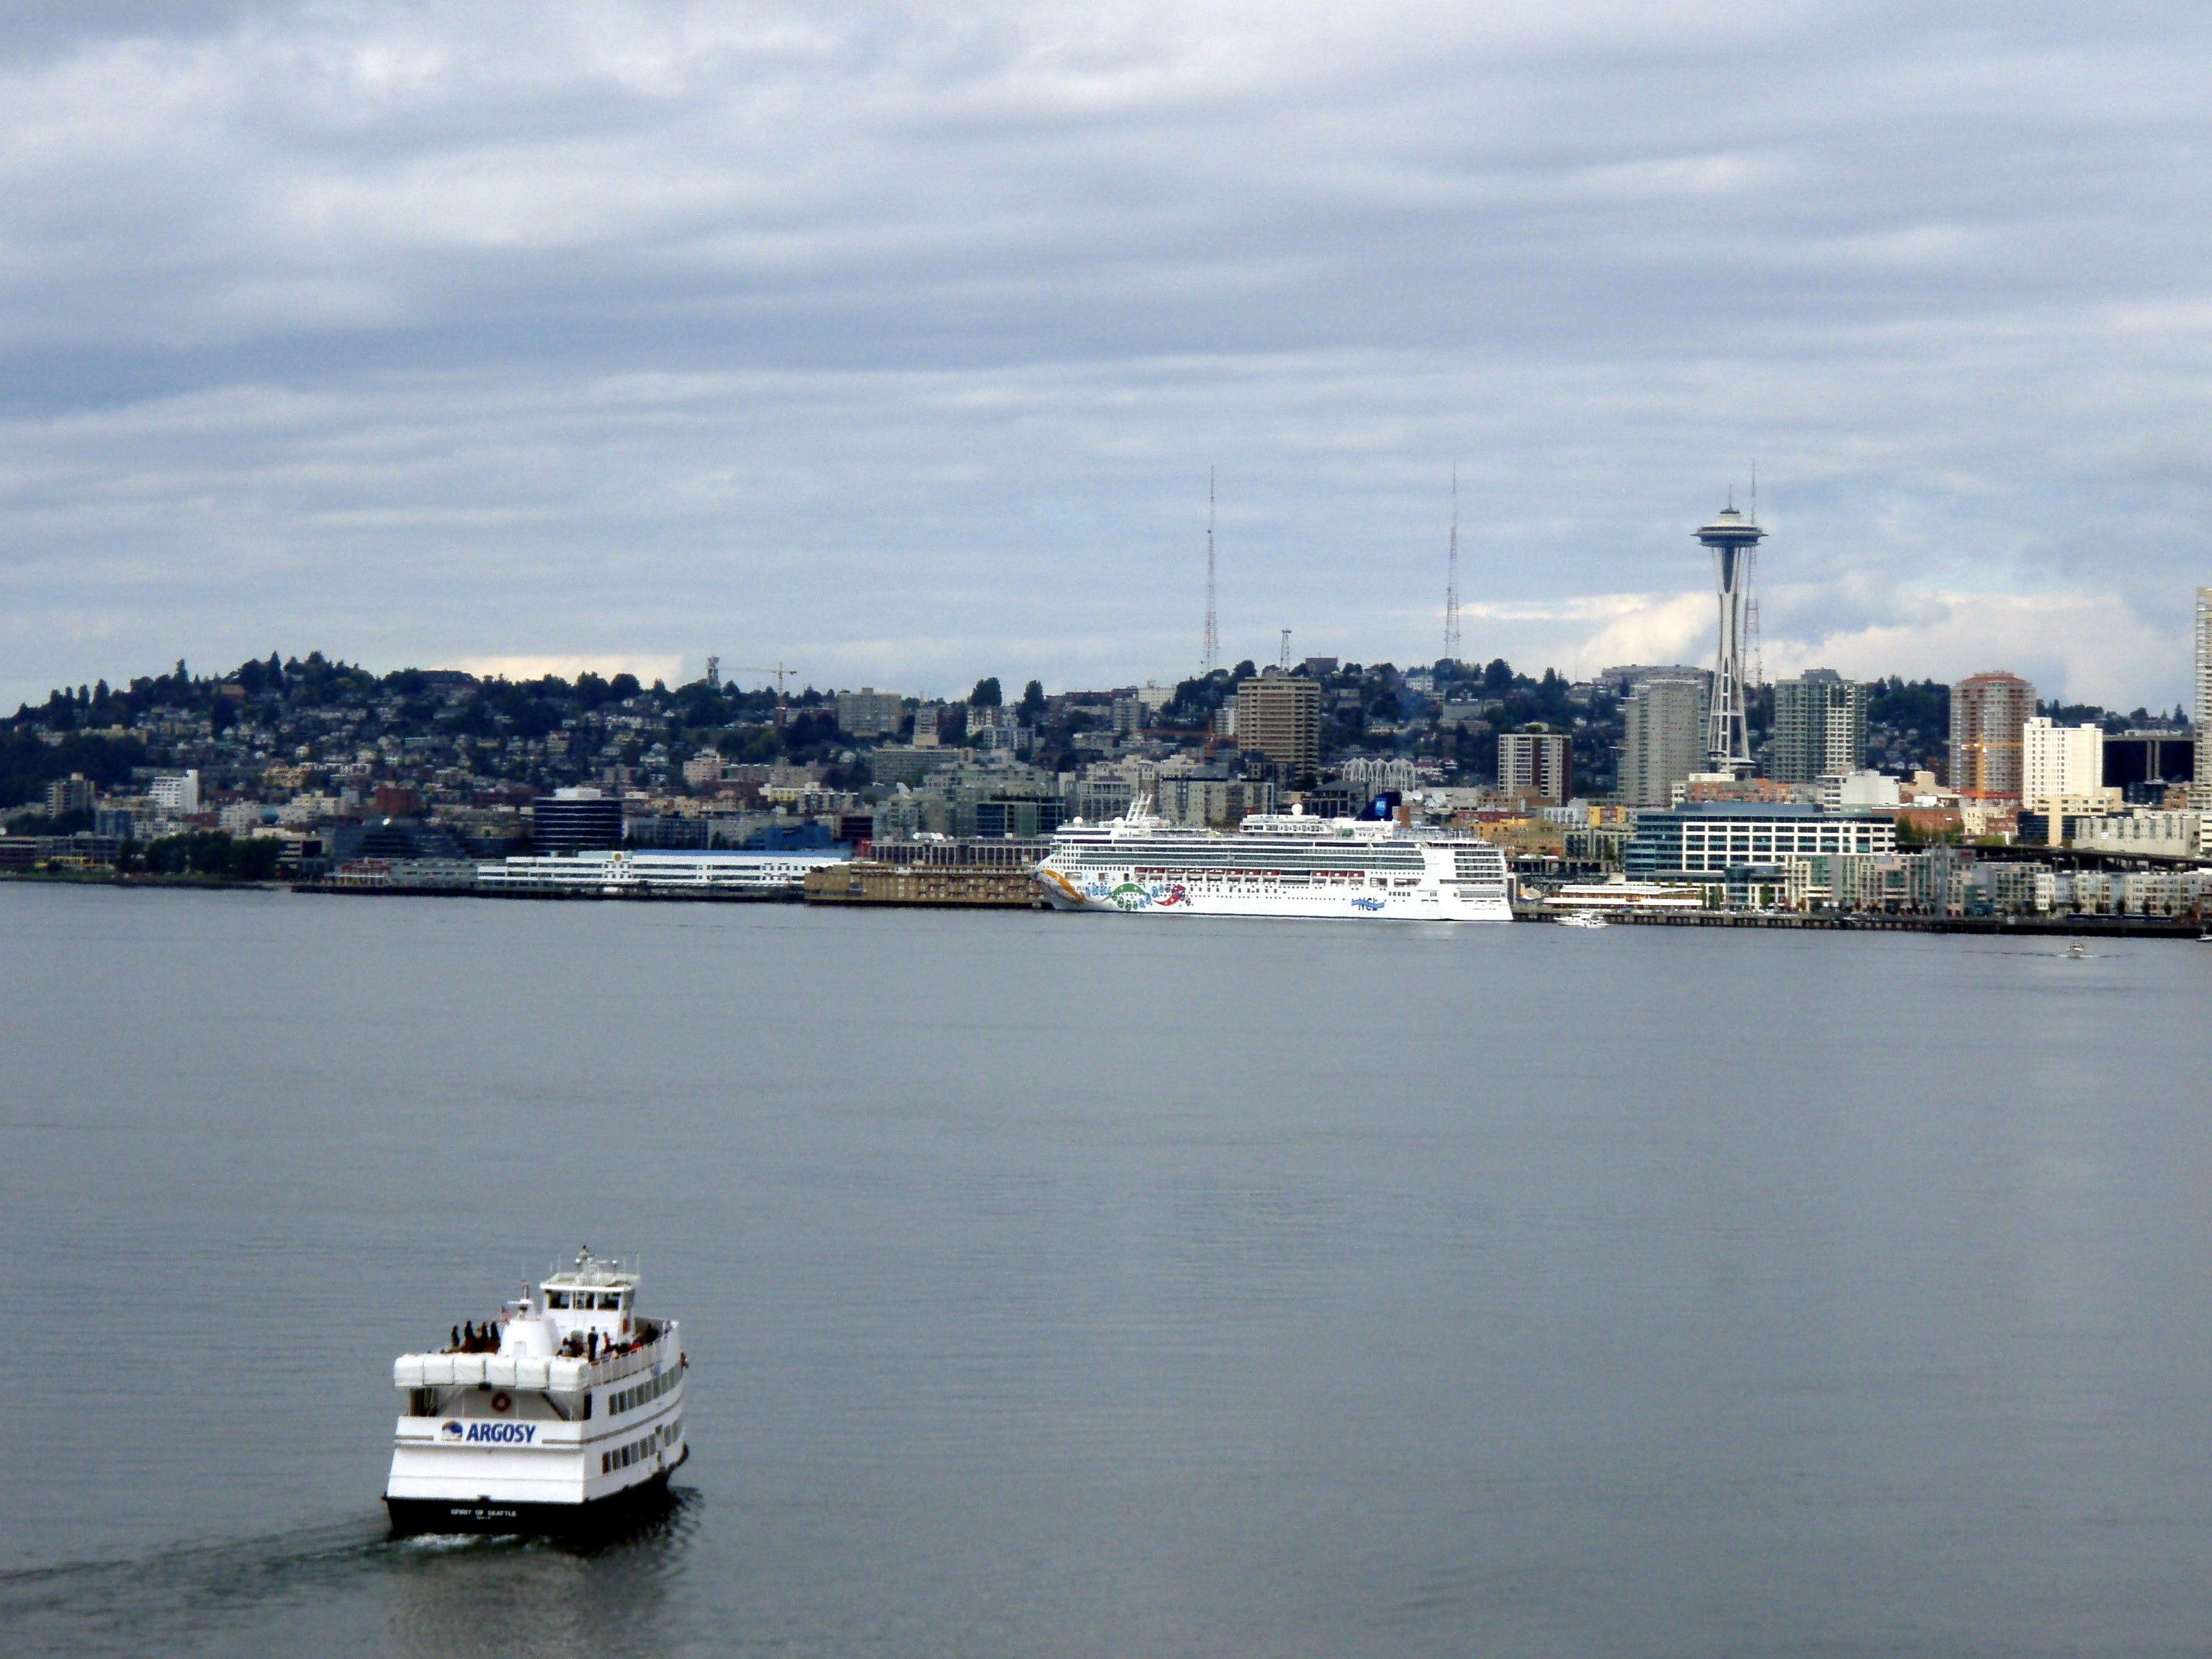 Bell Street Cruise Terminal at Pier 66, Seattle, Washington, United States of America